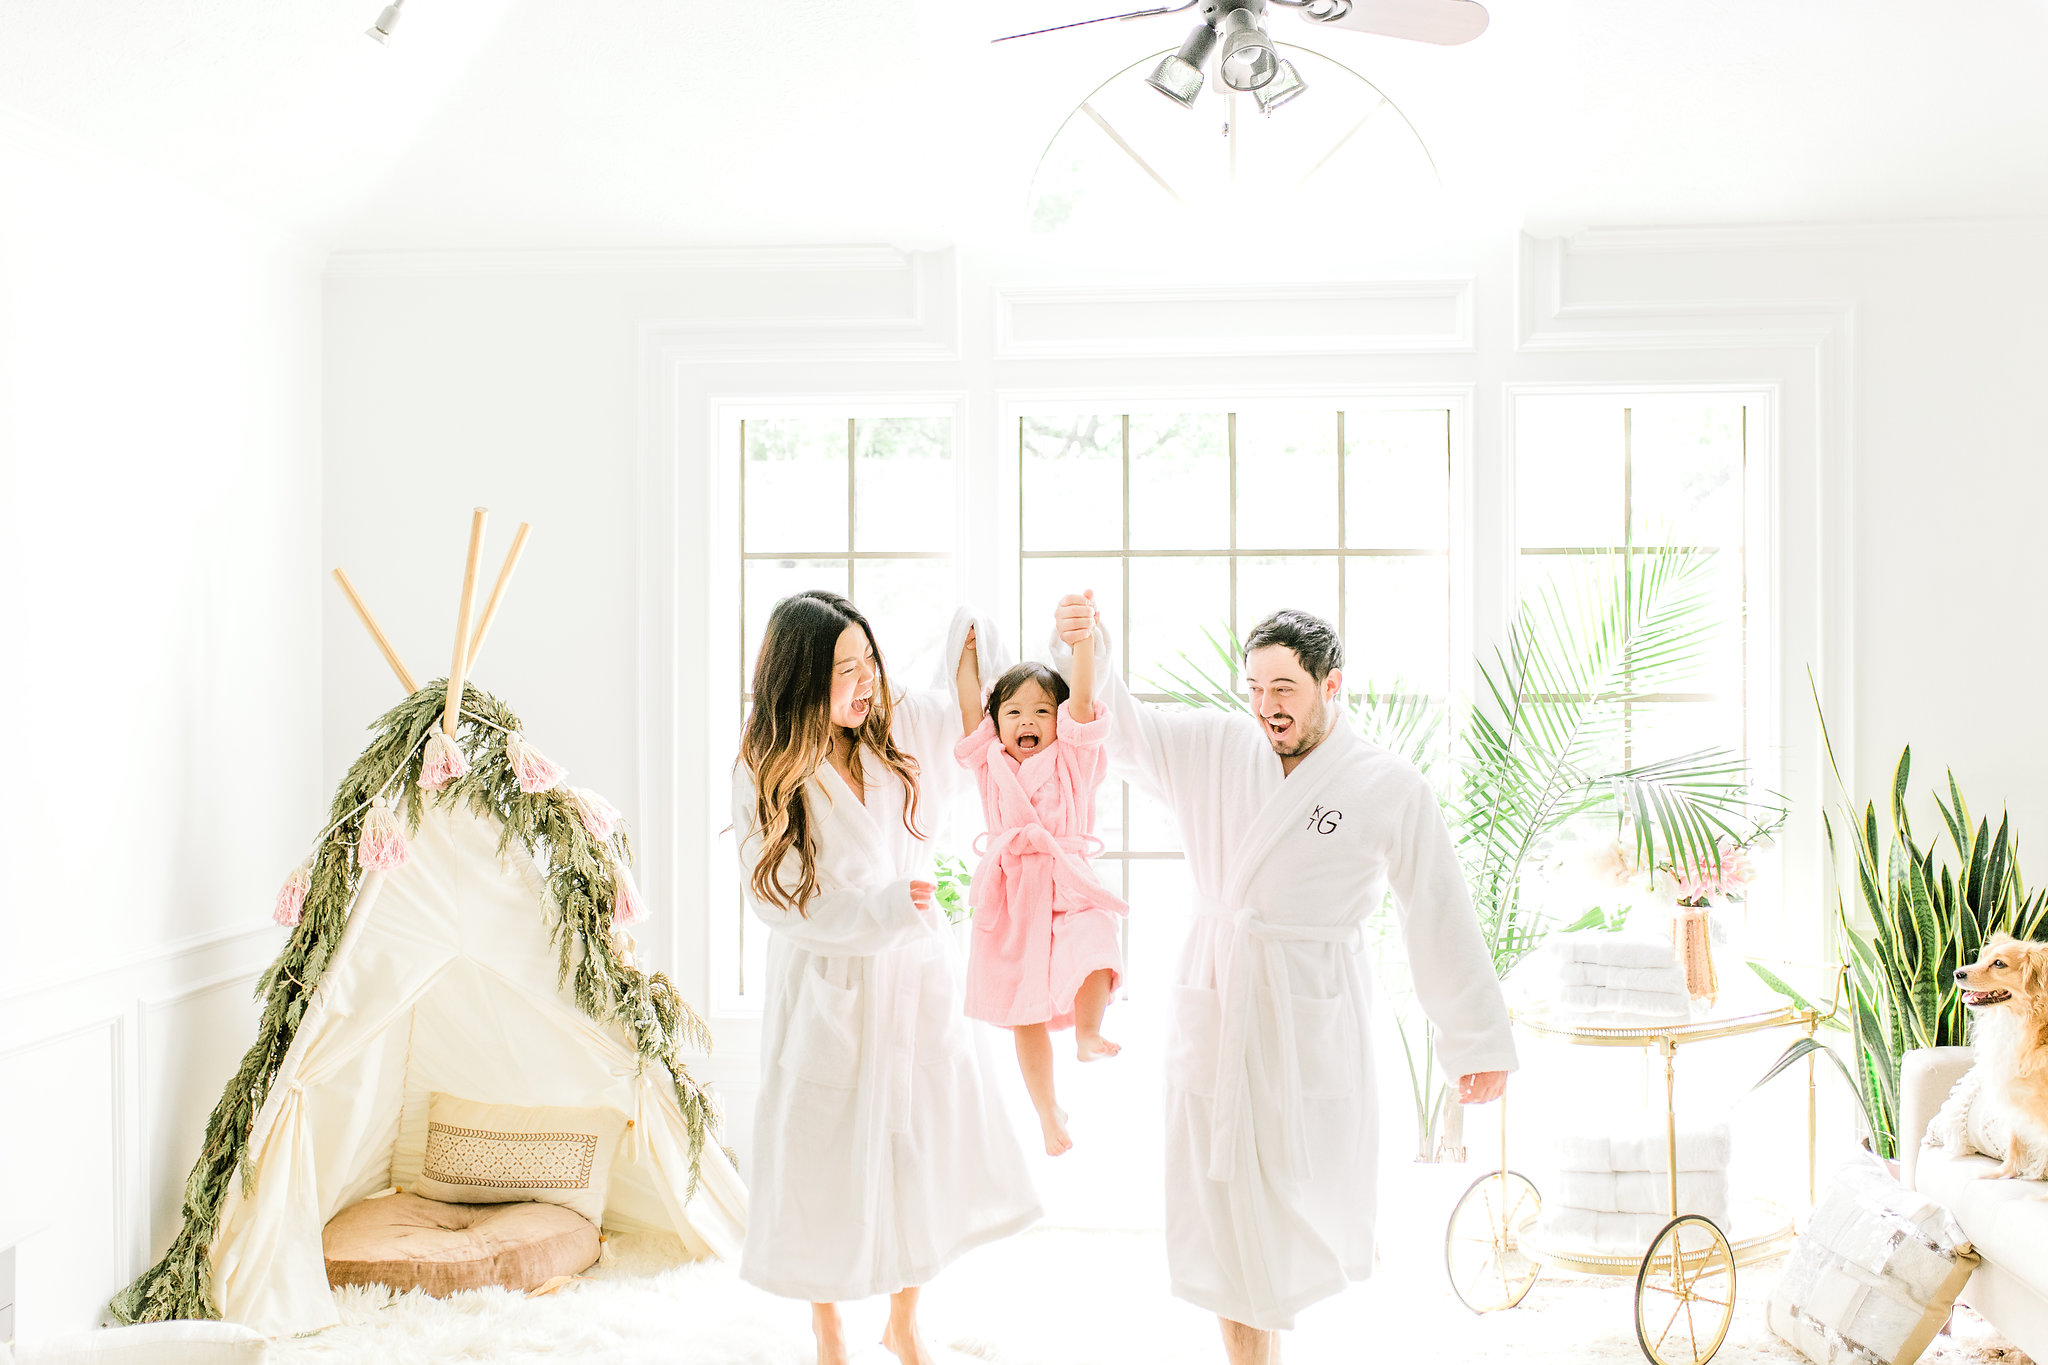 Joyfullygreen The Company Store Unisex White Fluffy Robe Monogramed Mother's Day Gift Idea. Wall paper nursery inspirati.jpg